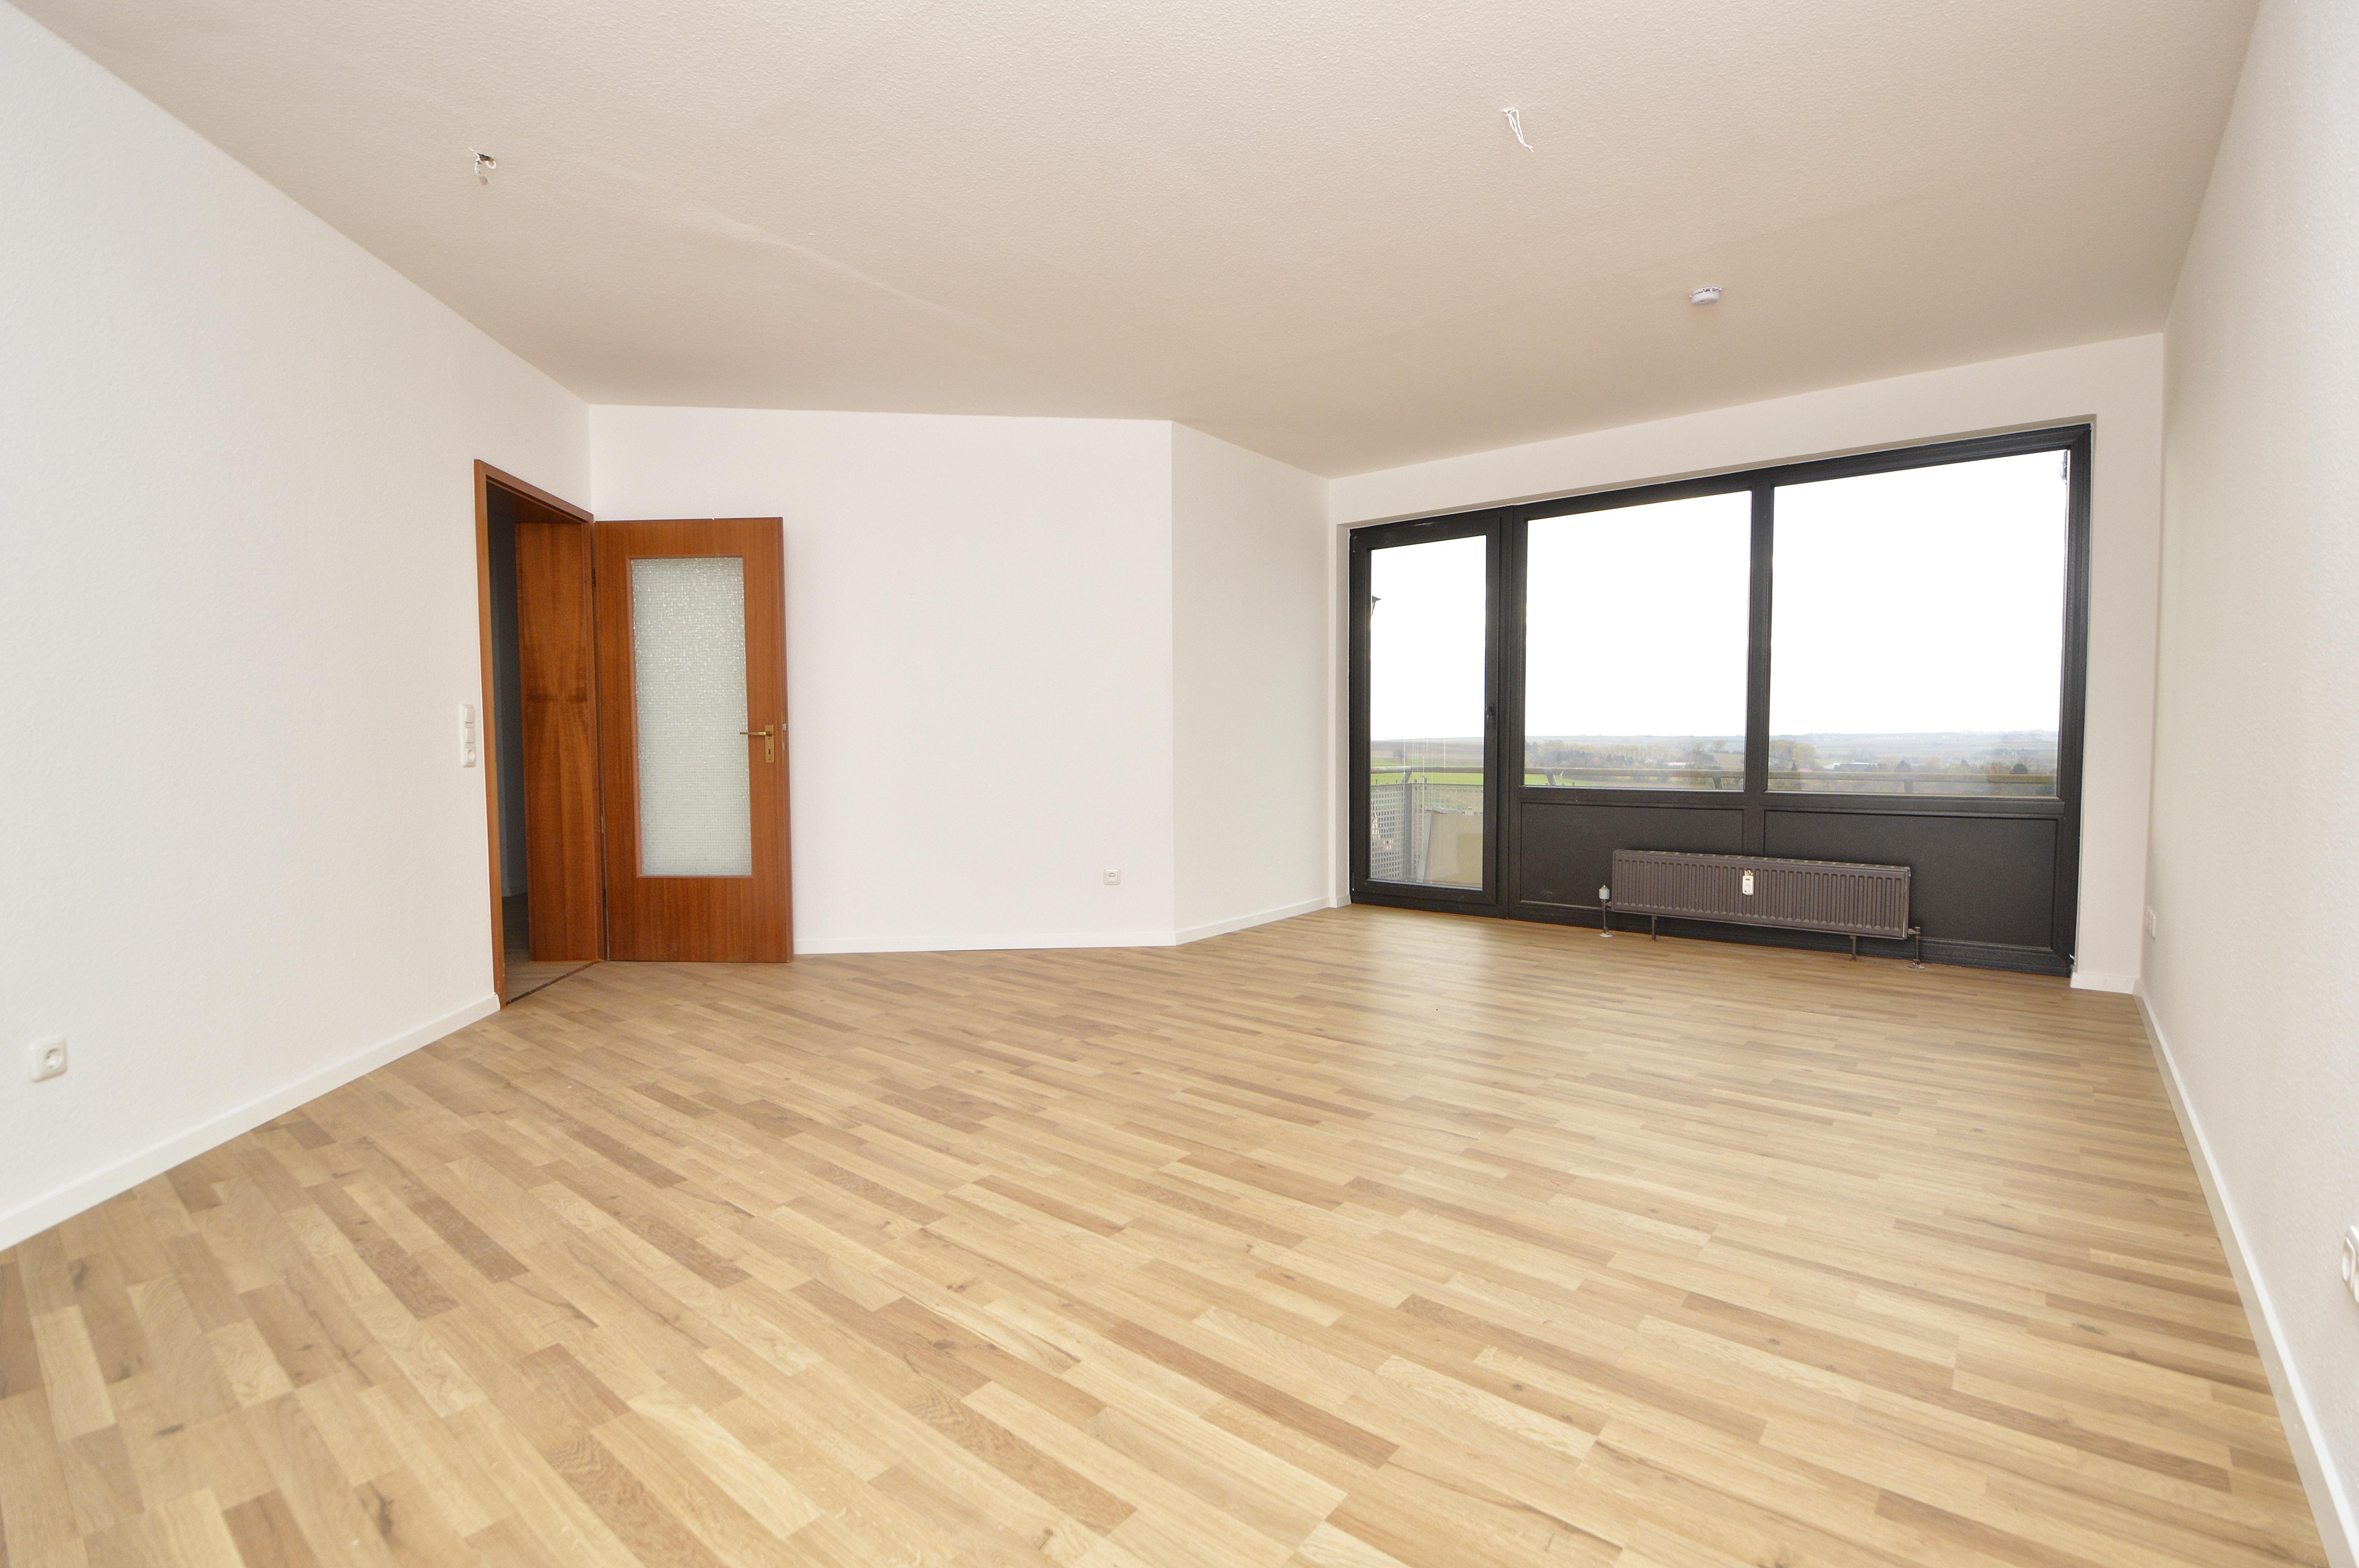 AP Immobilien GmbH - Ihr IVD Immobilienmakler aus Mainz - 55129 Mainz